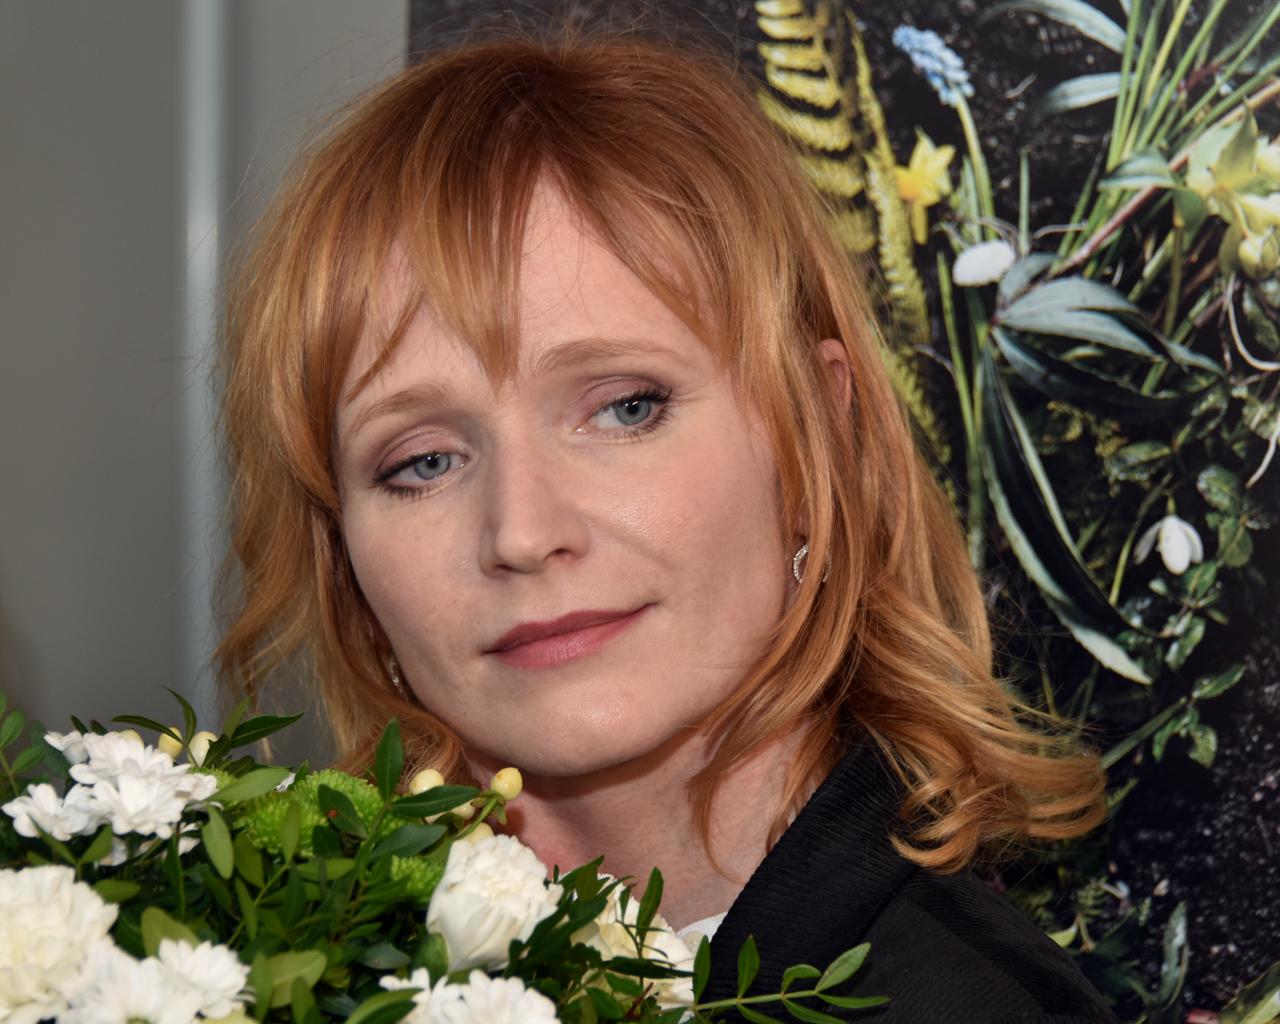 100 Images of Ana Geislerova